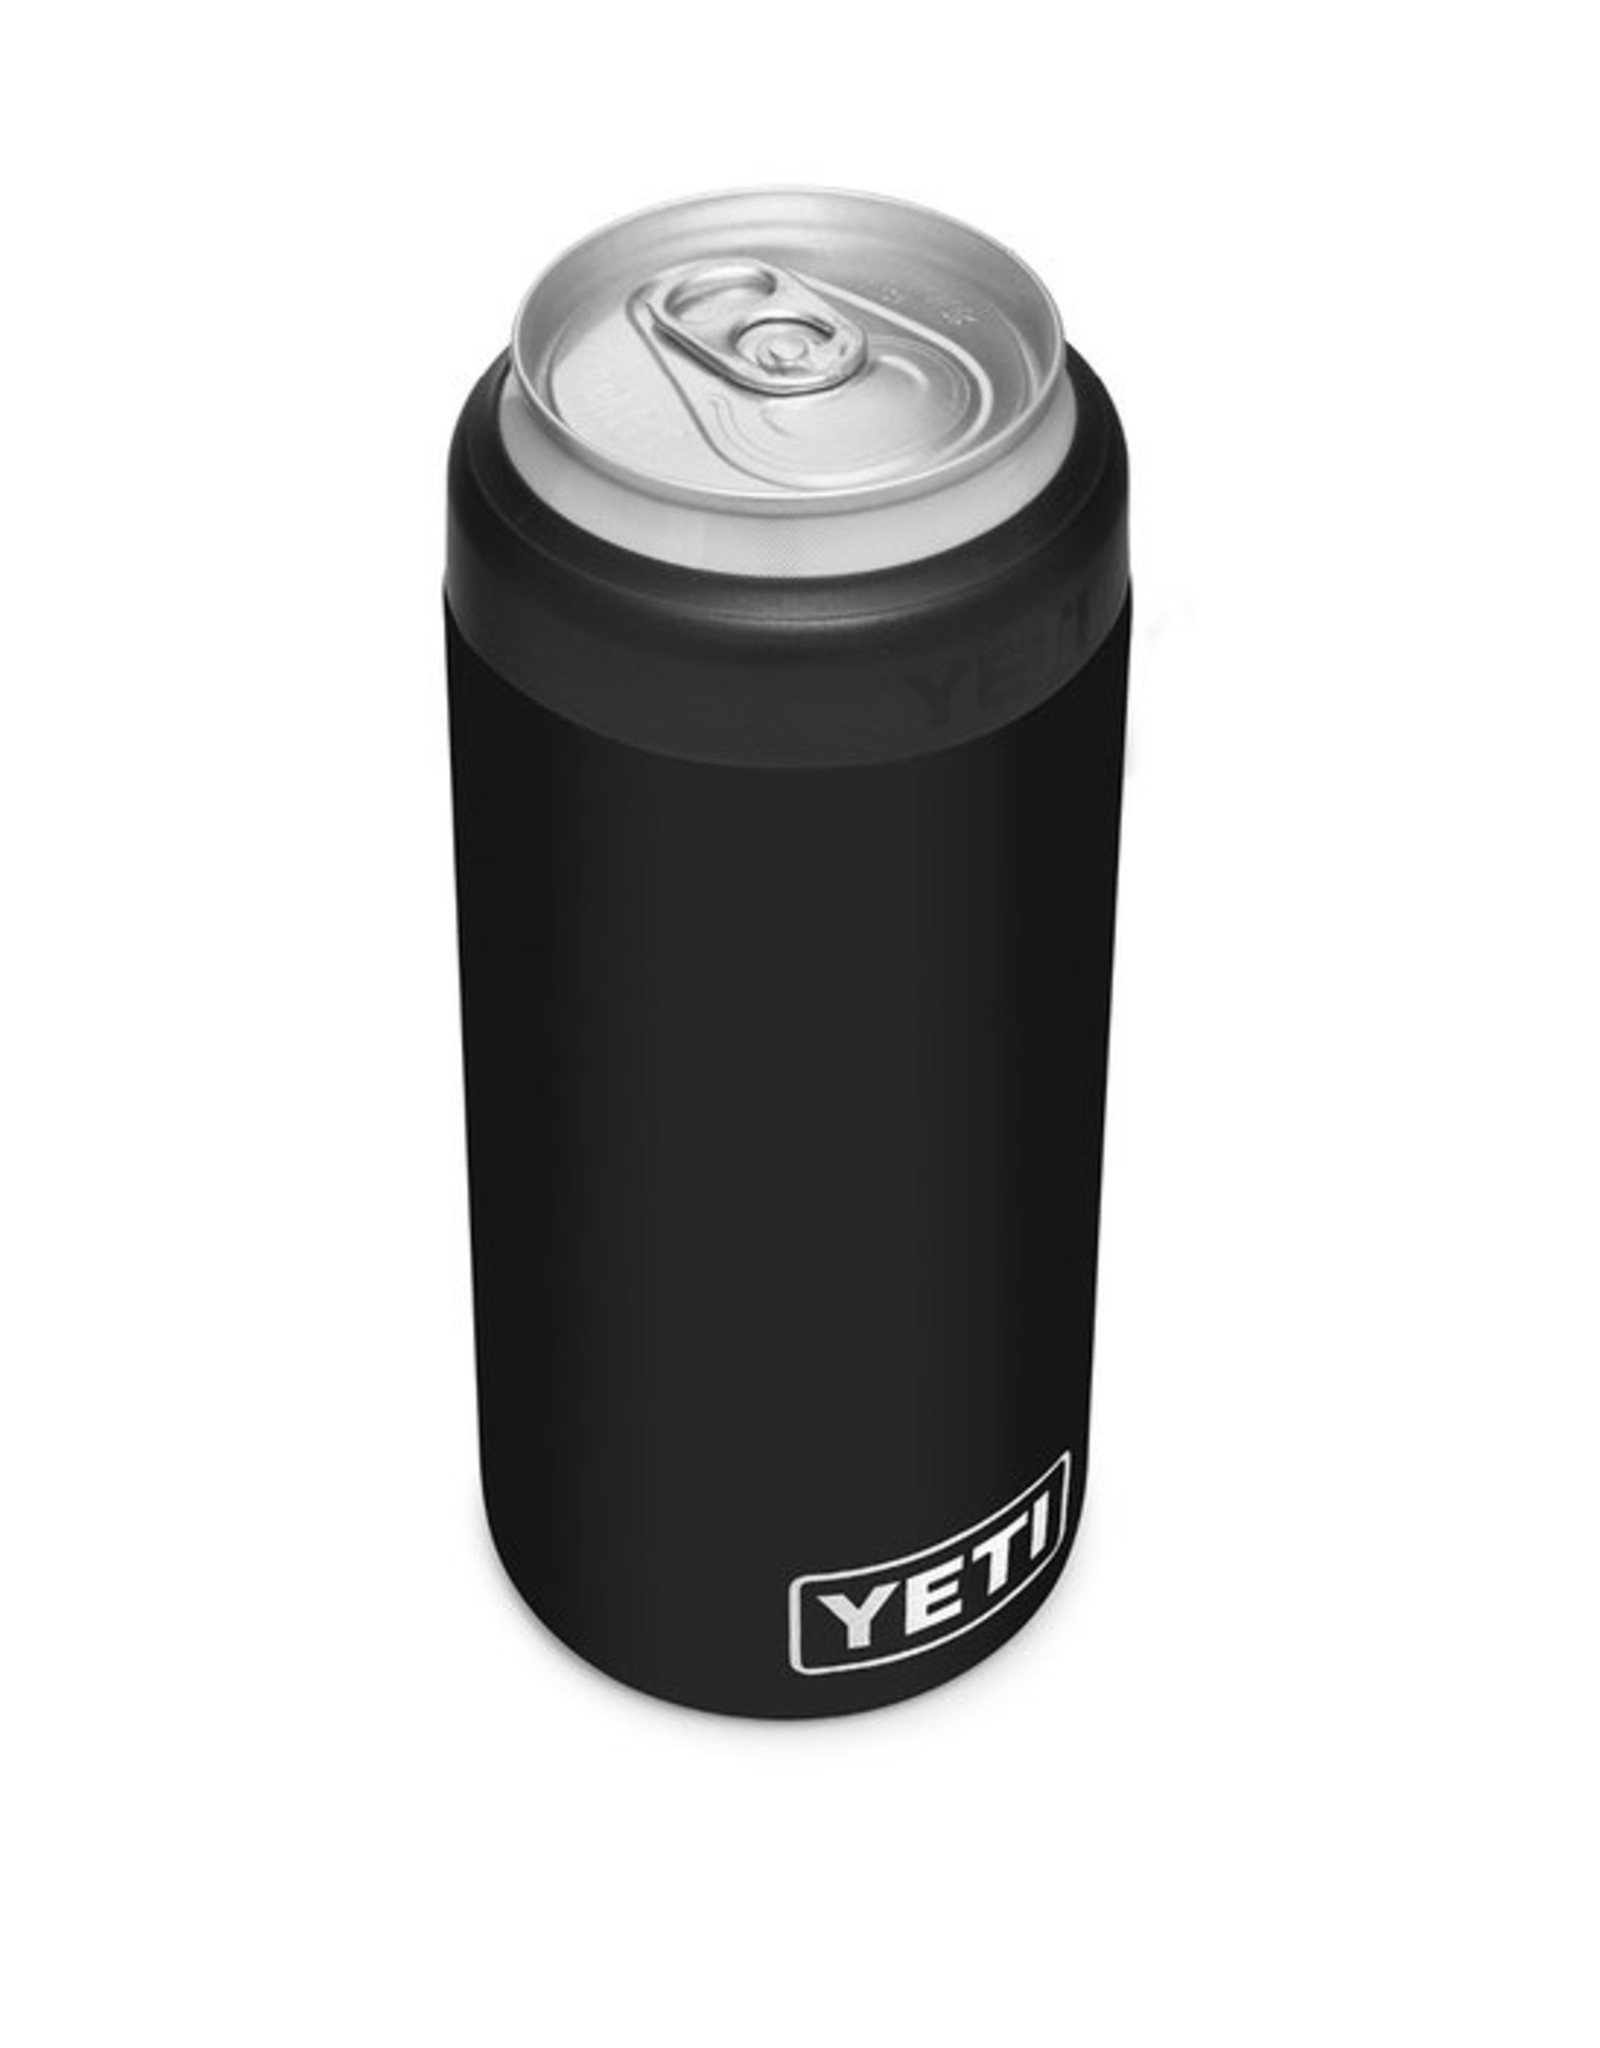 YETI Coolers Colster Slim-Black